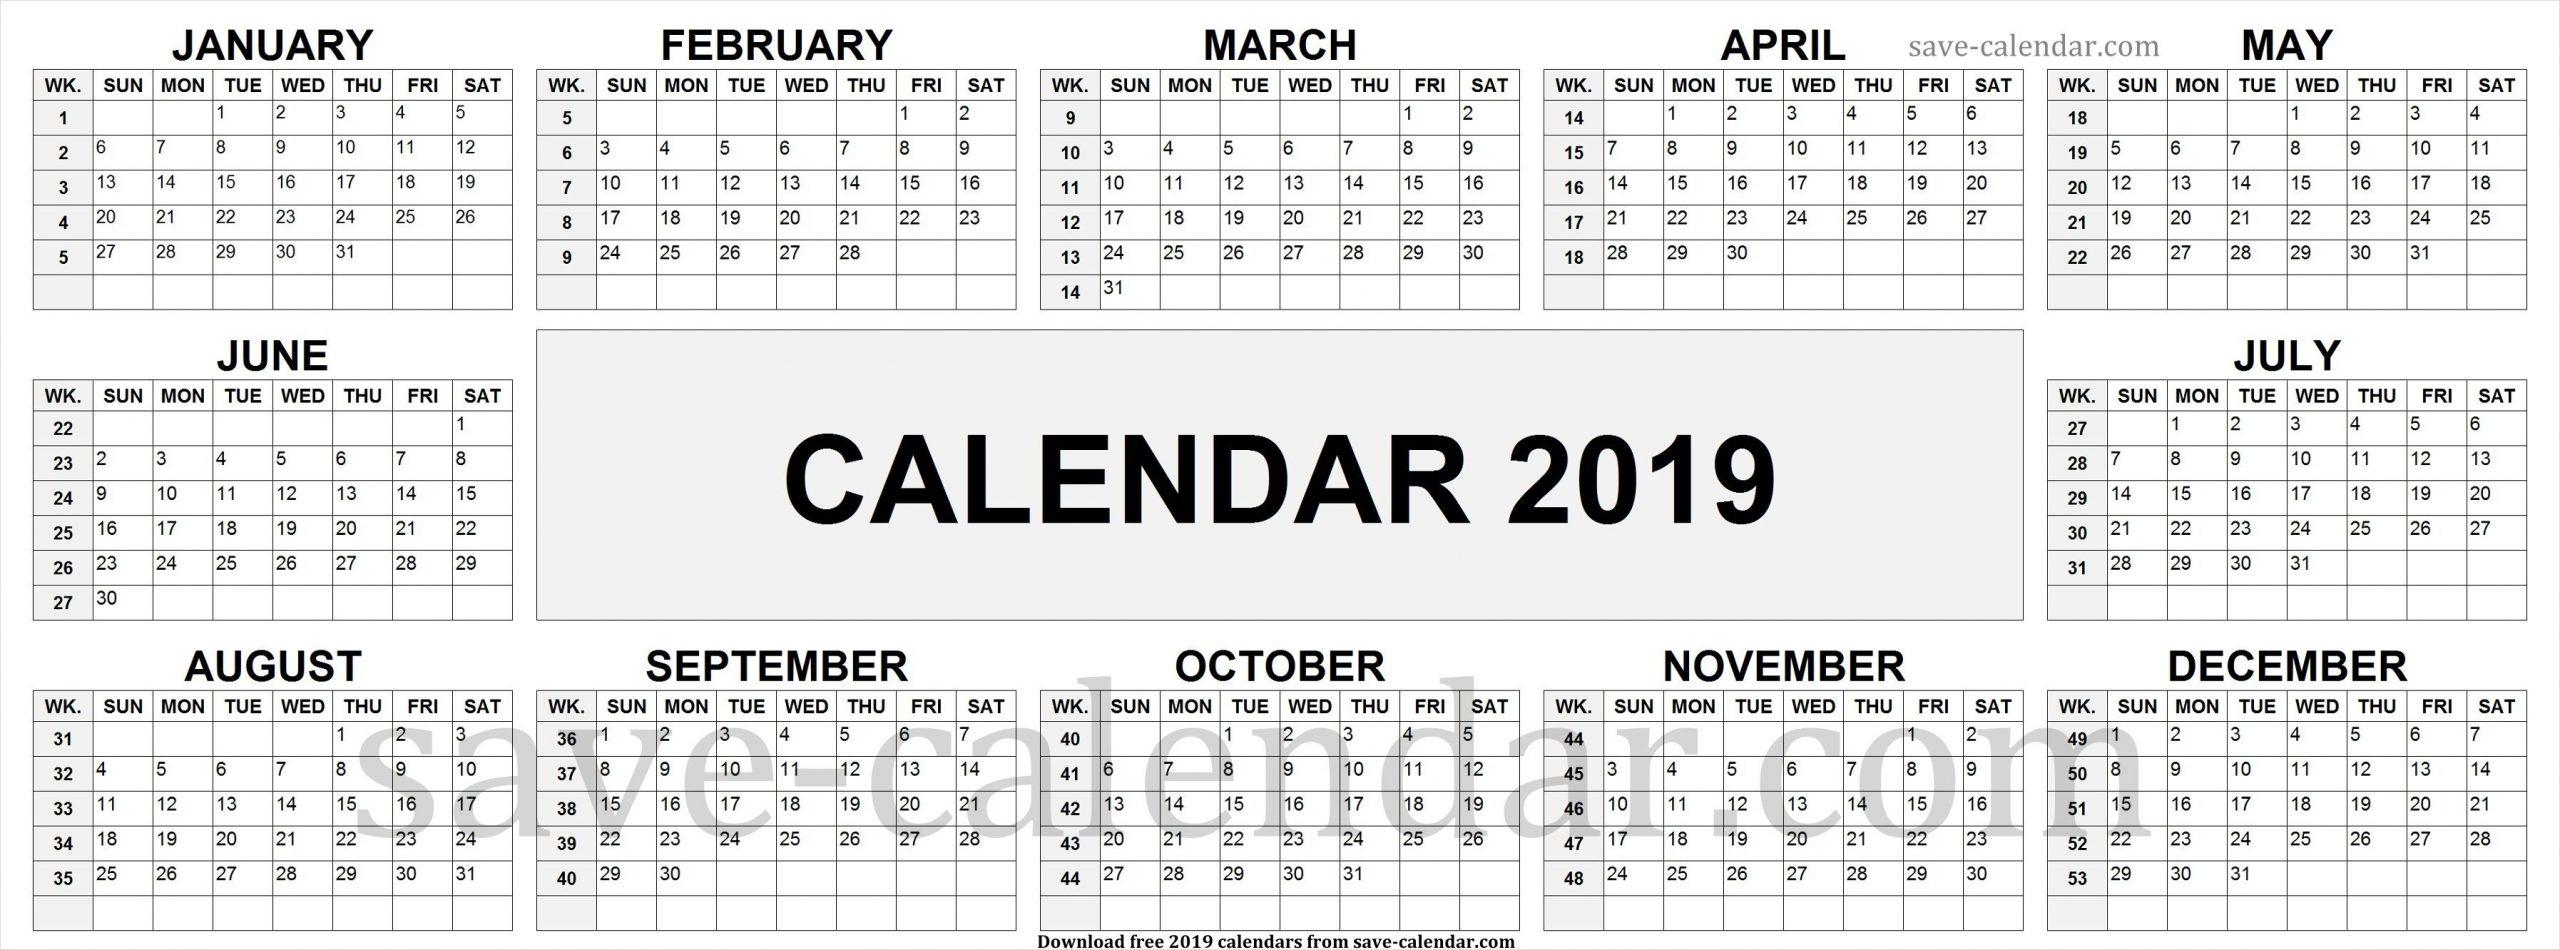 Take Depo Provera Perpetual Calendar 2020 | Calendar